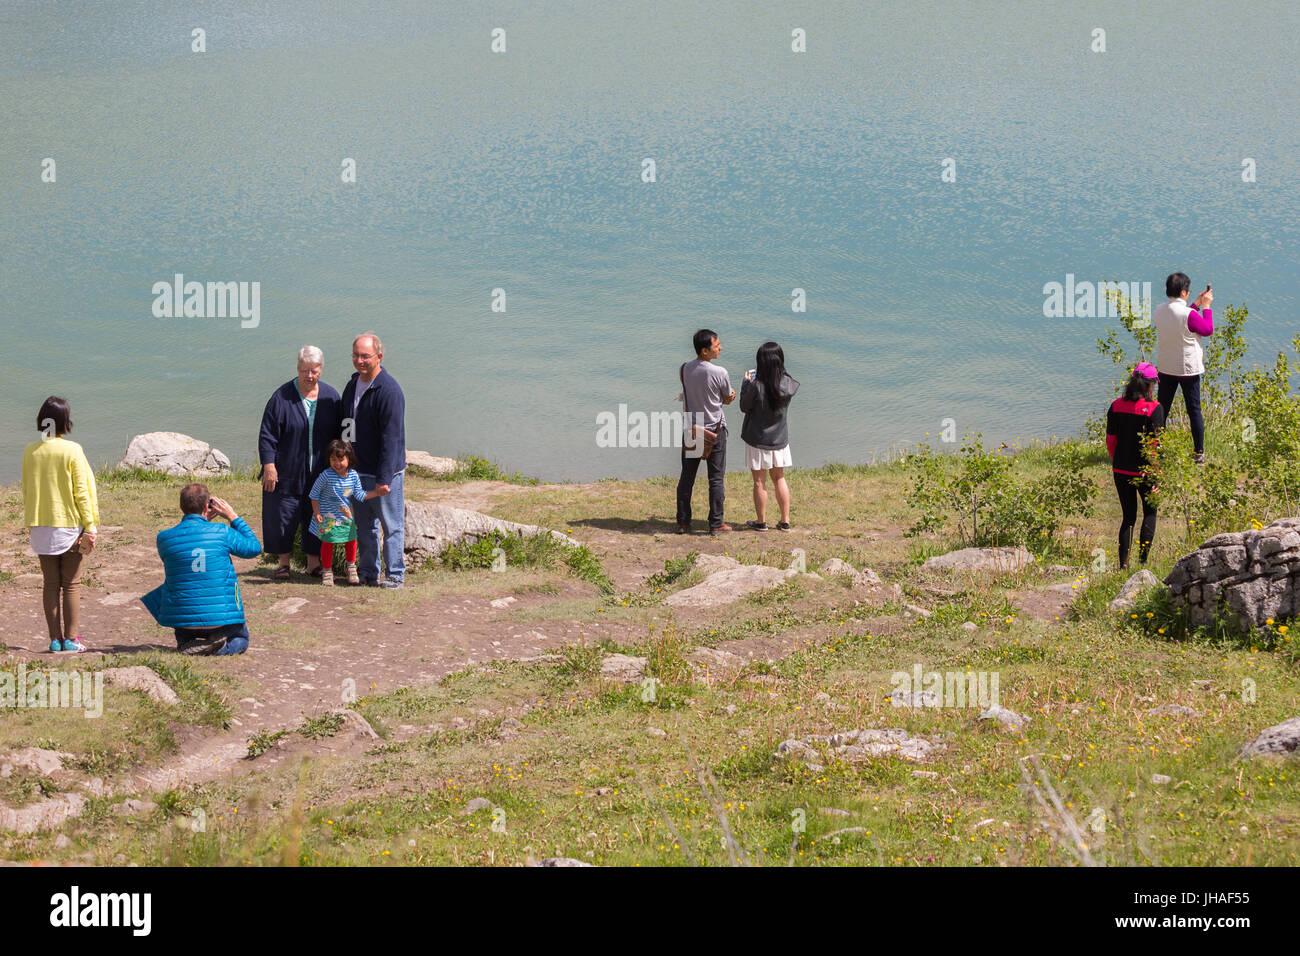 Tourists are taking photos at Medicine Lake in Jasper National Park, Alberta, Canada Stock Photo